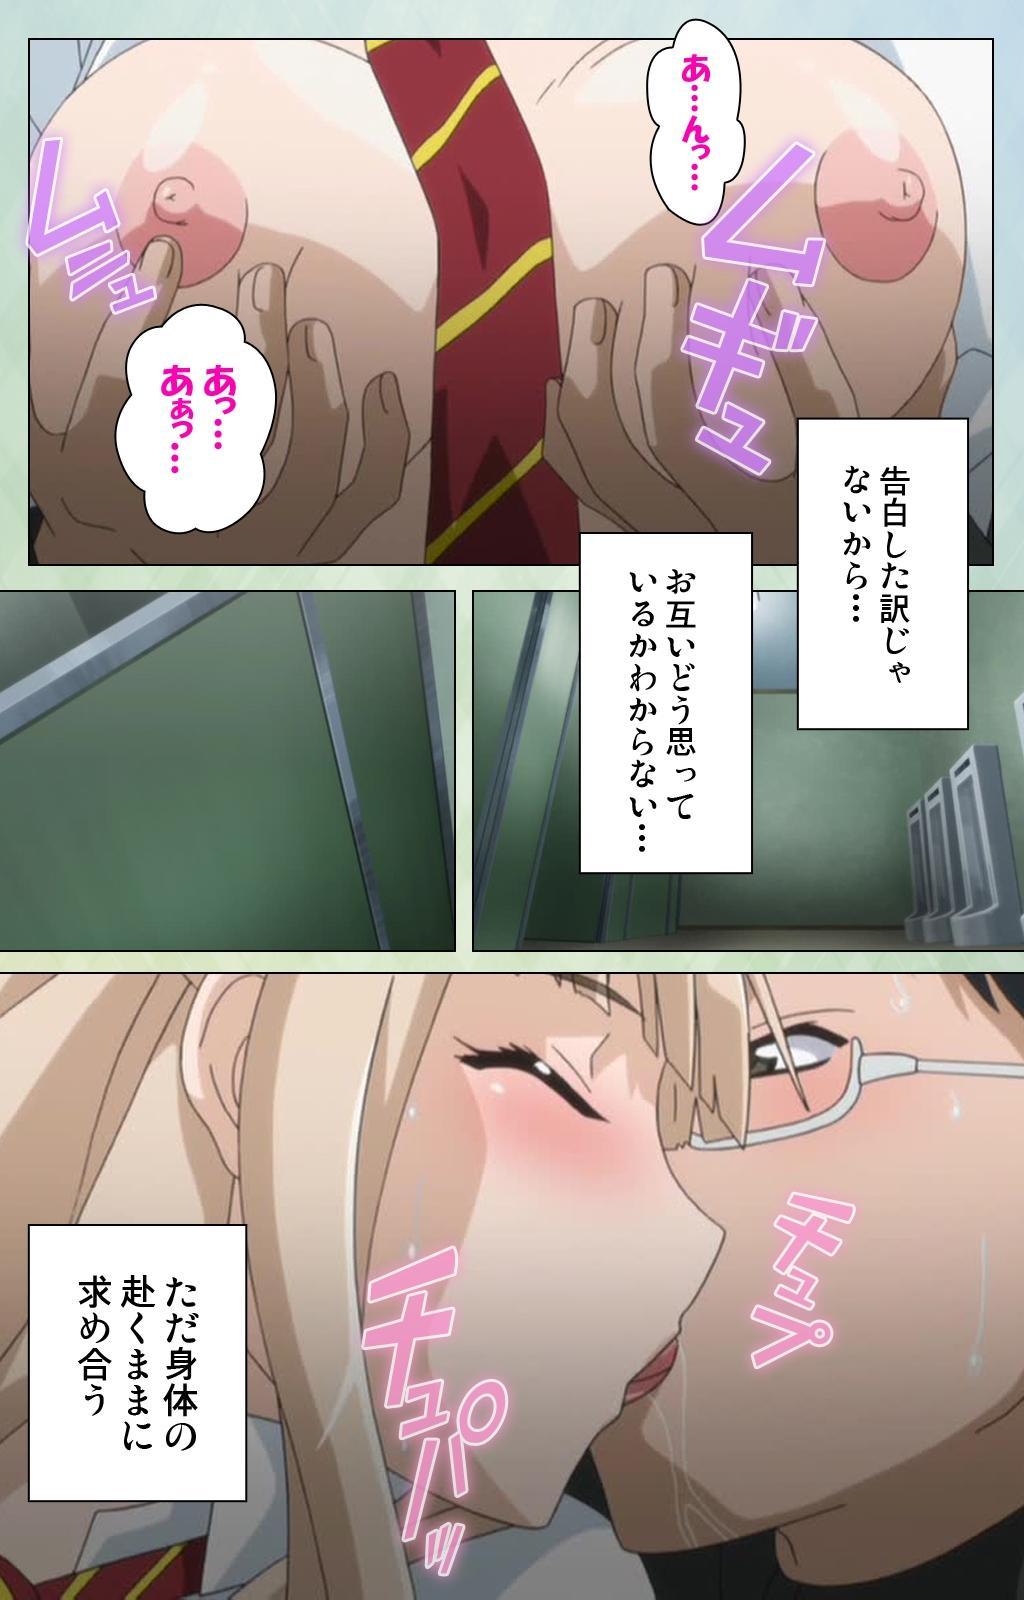 Furueru Kuchibiru fuzzy lips1 Complete Ban 10